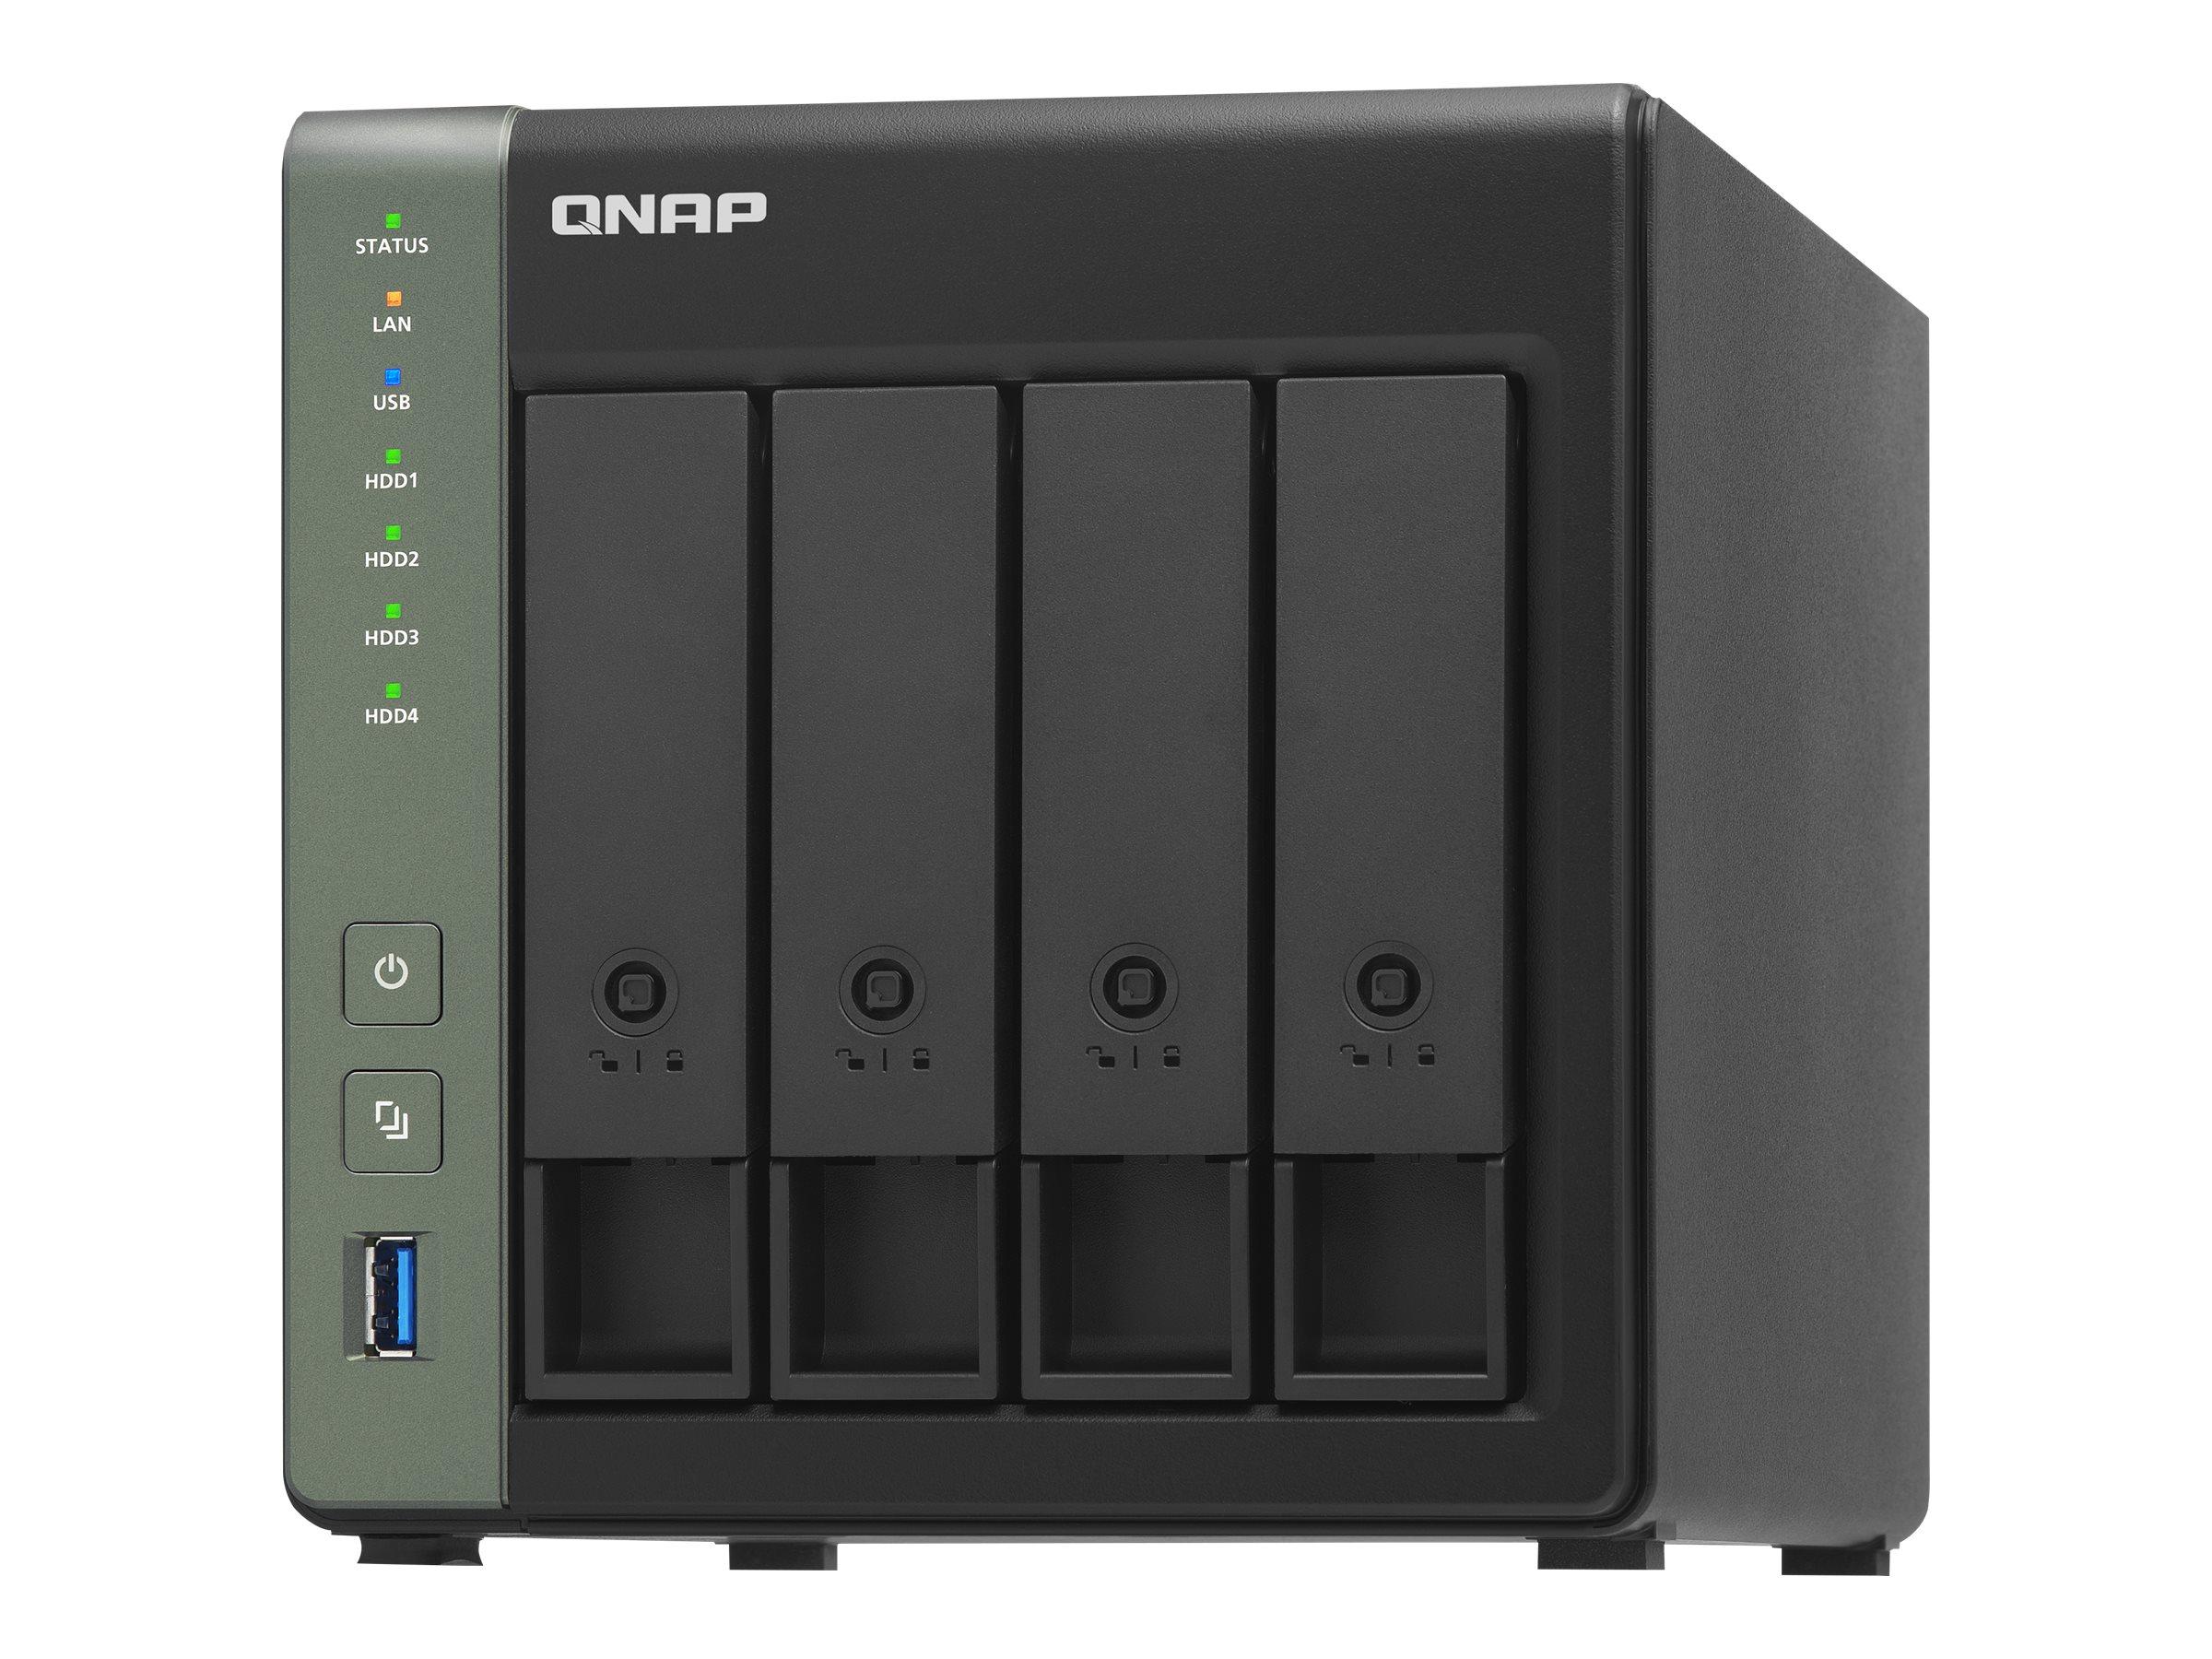 QNAP TS-431K - NAS-Server - 4 Schächte - SATA 6Gb/s